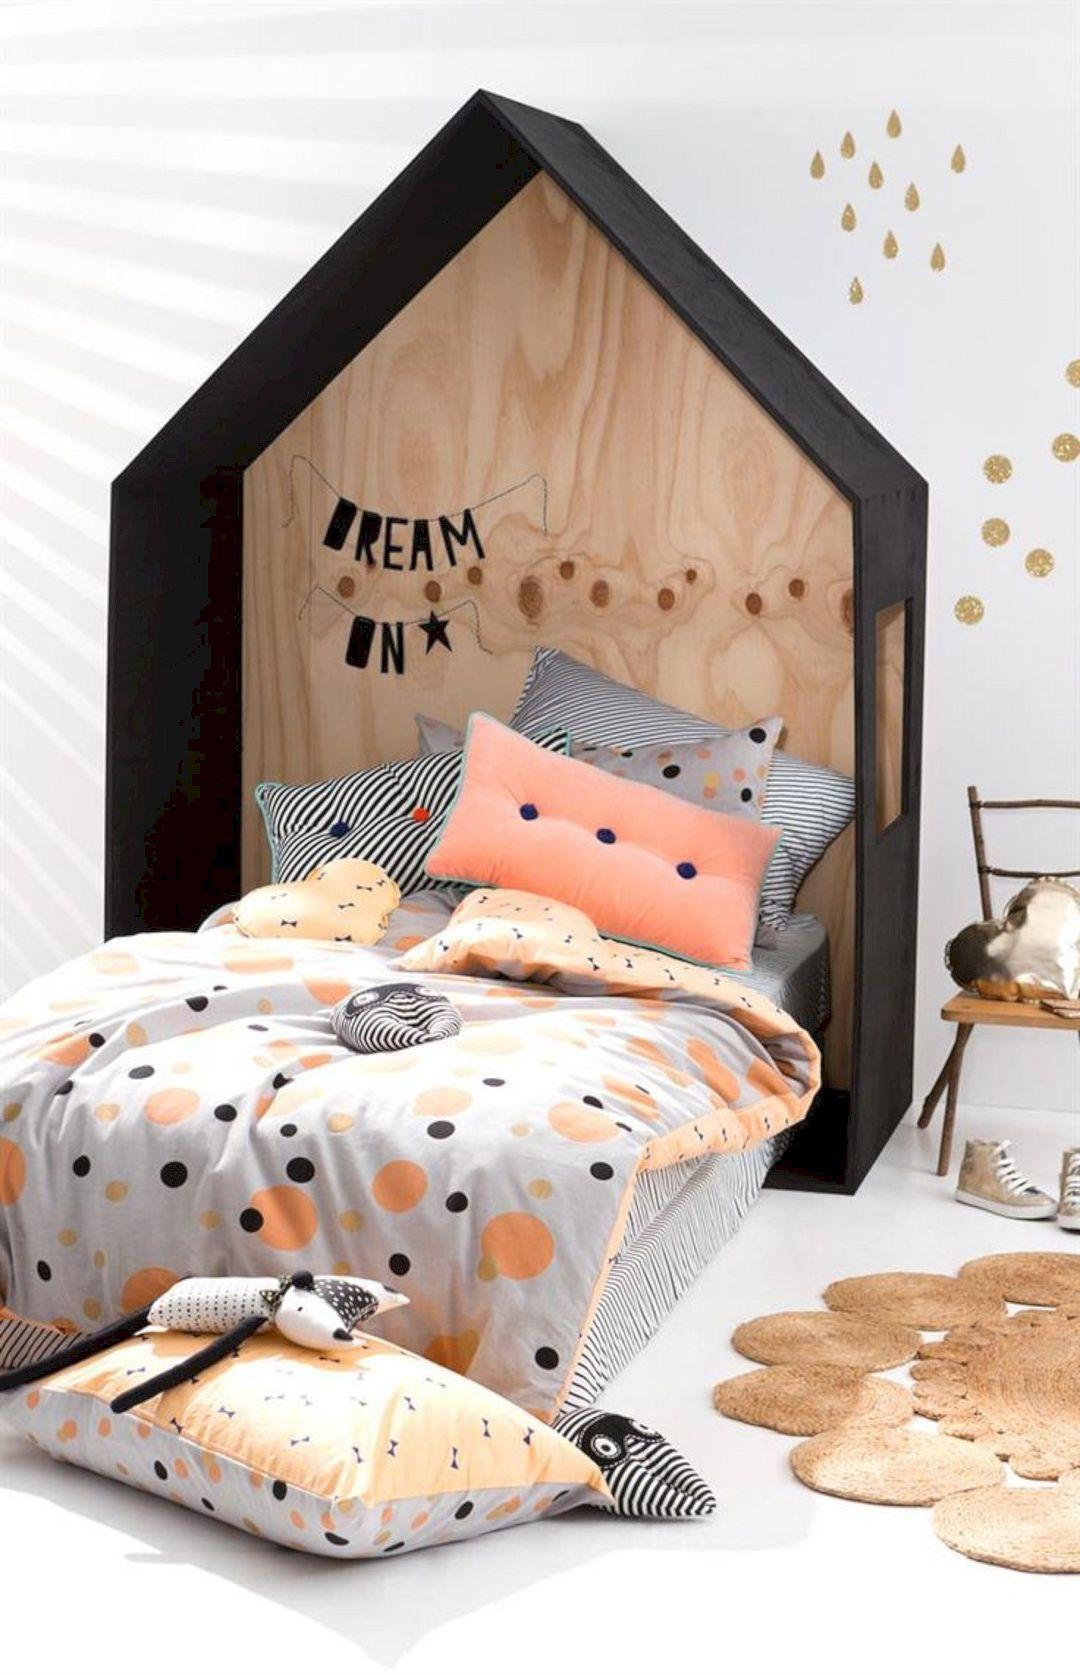 Best Charming Kid's Room Decor Ideas https://www.futuristarchitecture.com/22439-kids-room-decor-ideas.html